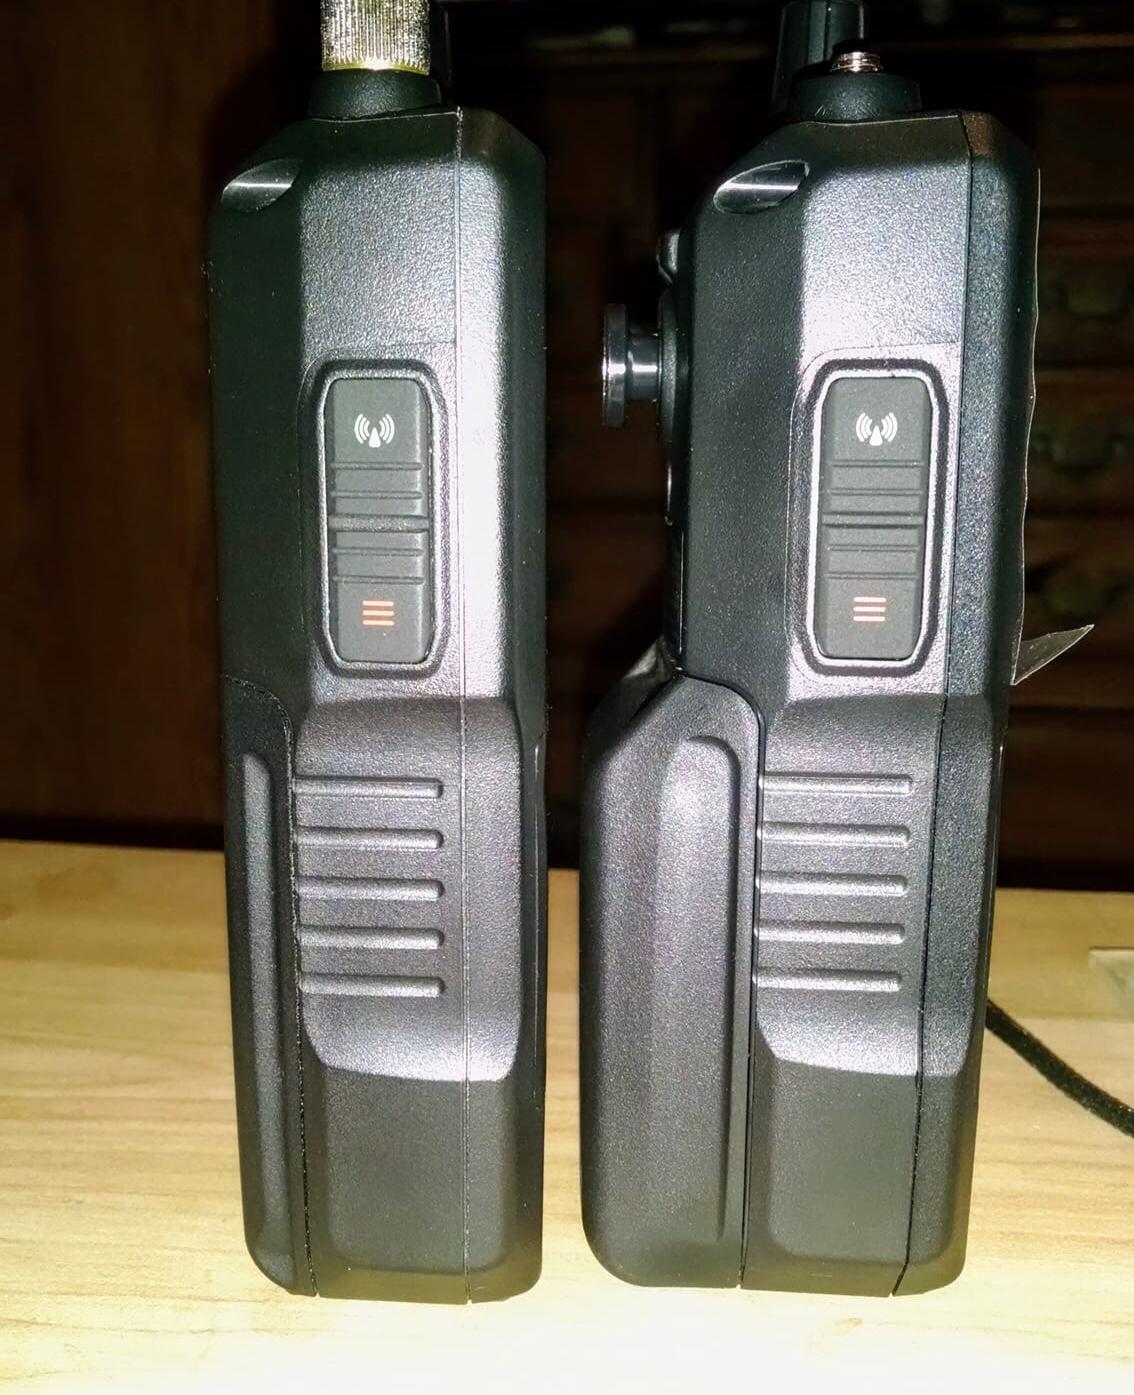 Uniden SDS100 SDR Scanner - AussieScanners com au